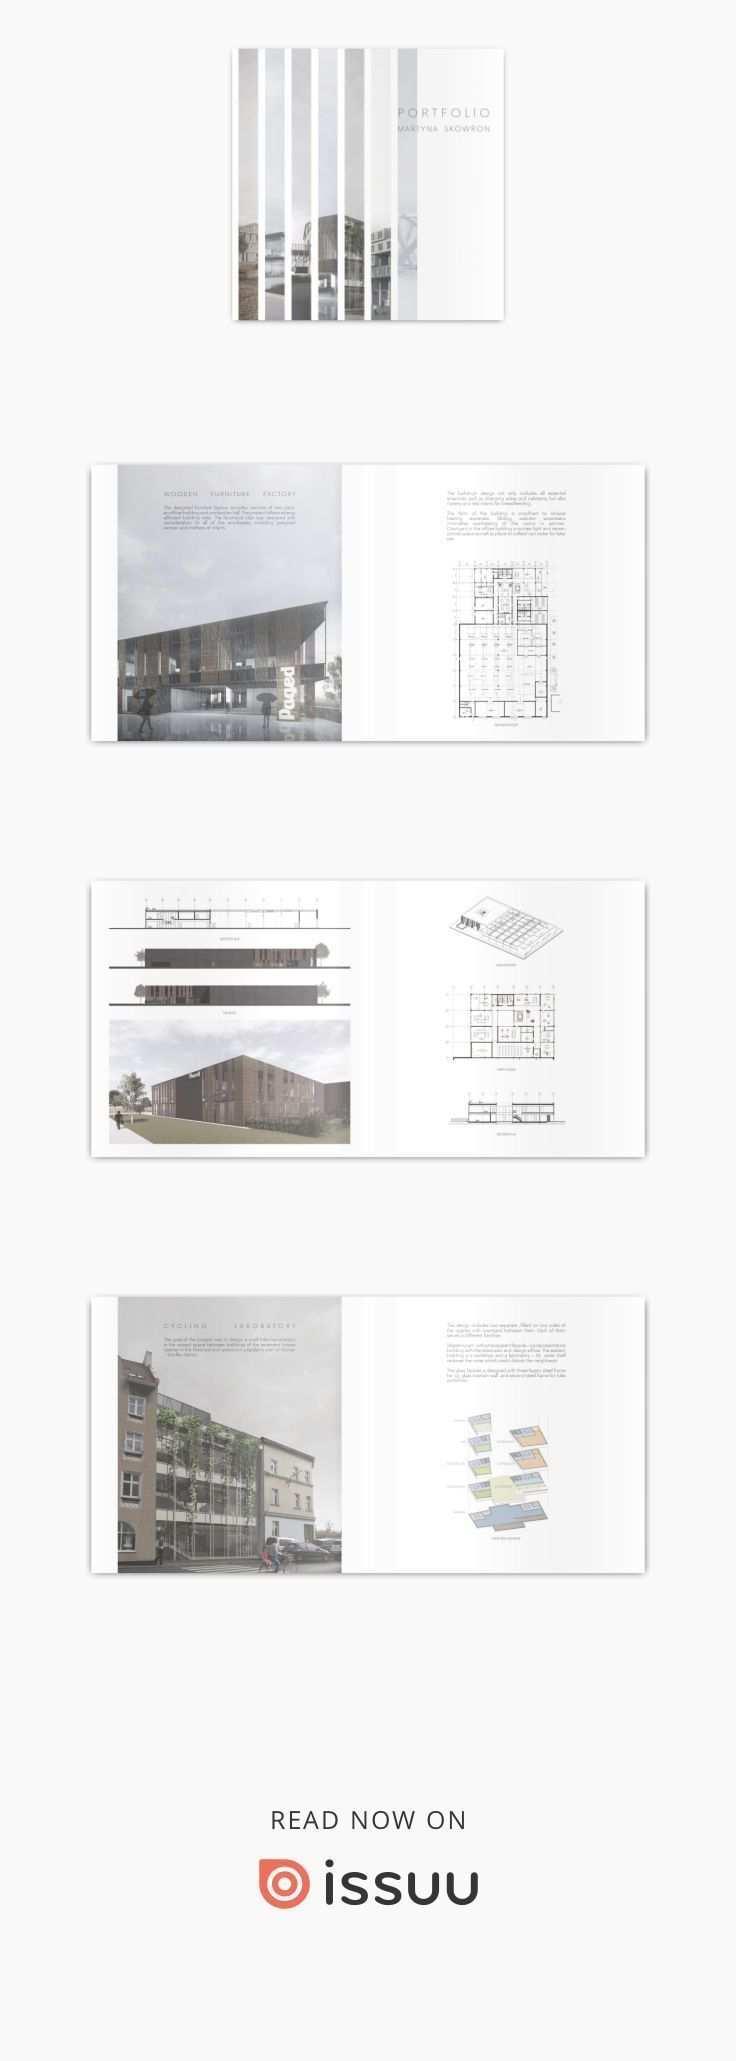 Portfolioarchitektur Portfolio Design Layouts Architektur Portfolio Architektur Portfolio Layout